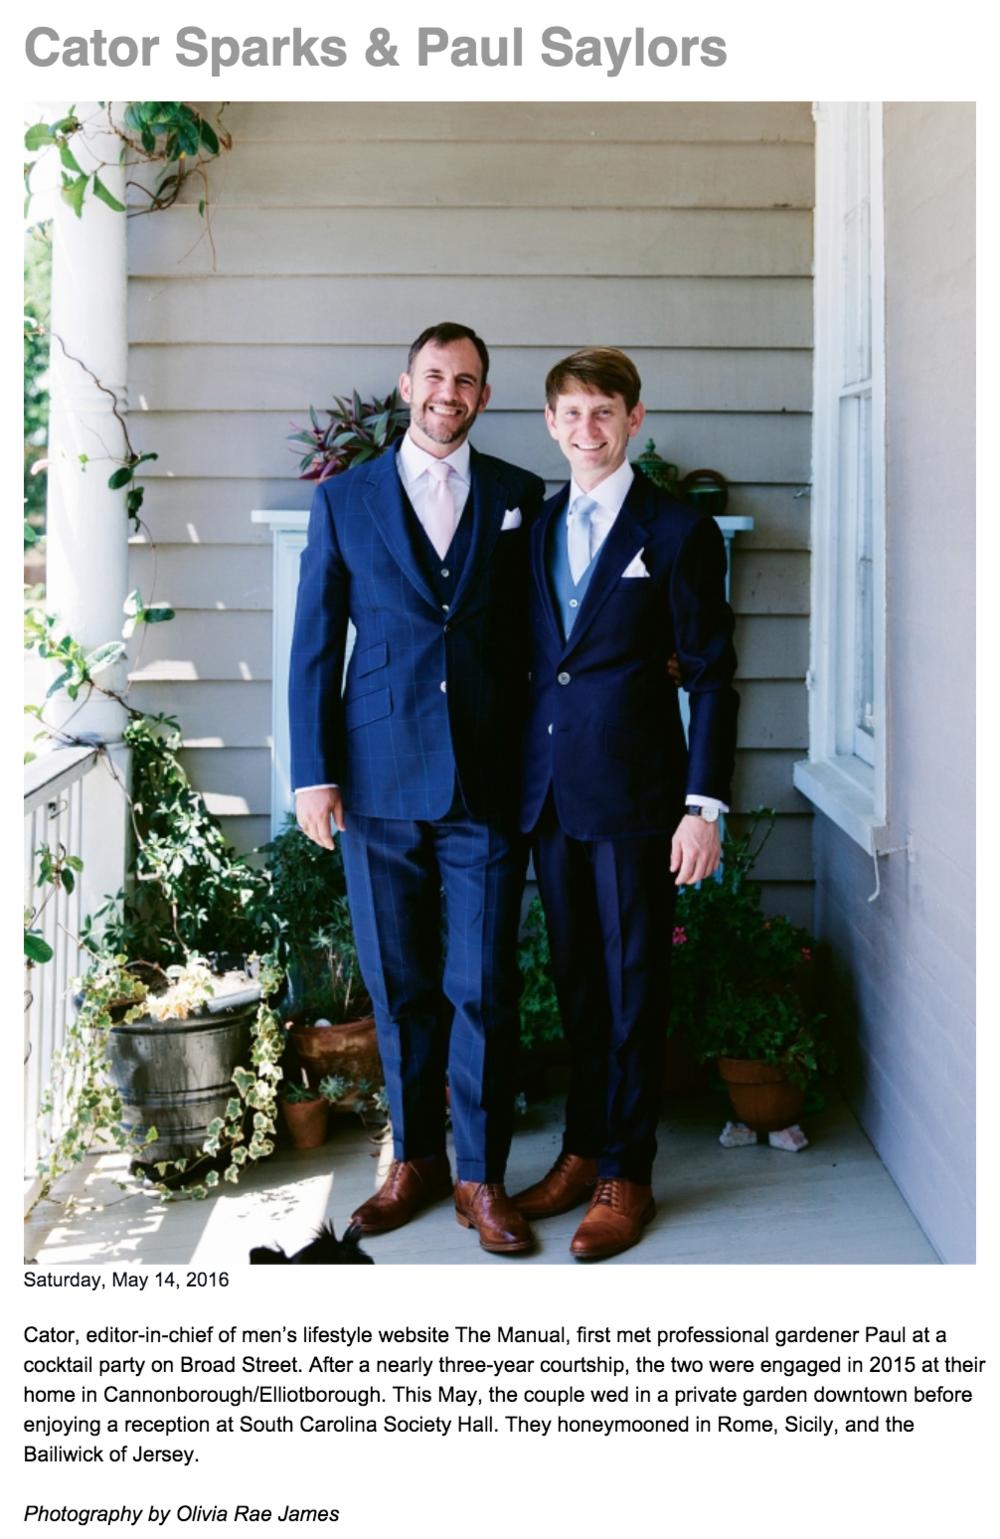 Charleston Magazine Wedding Announcement (click to view)